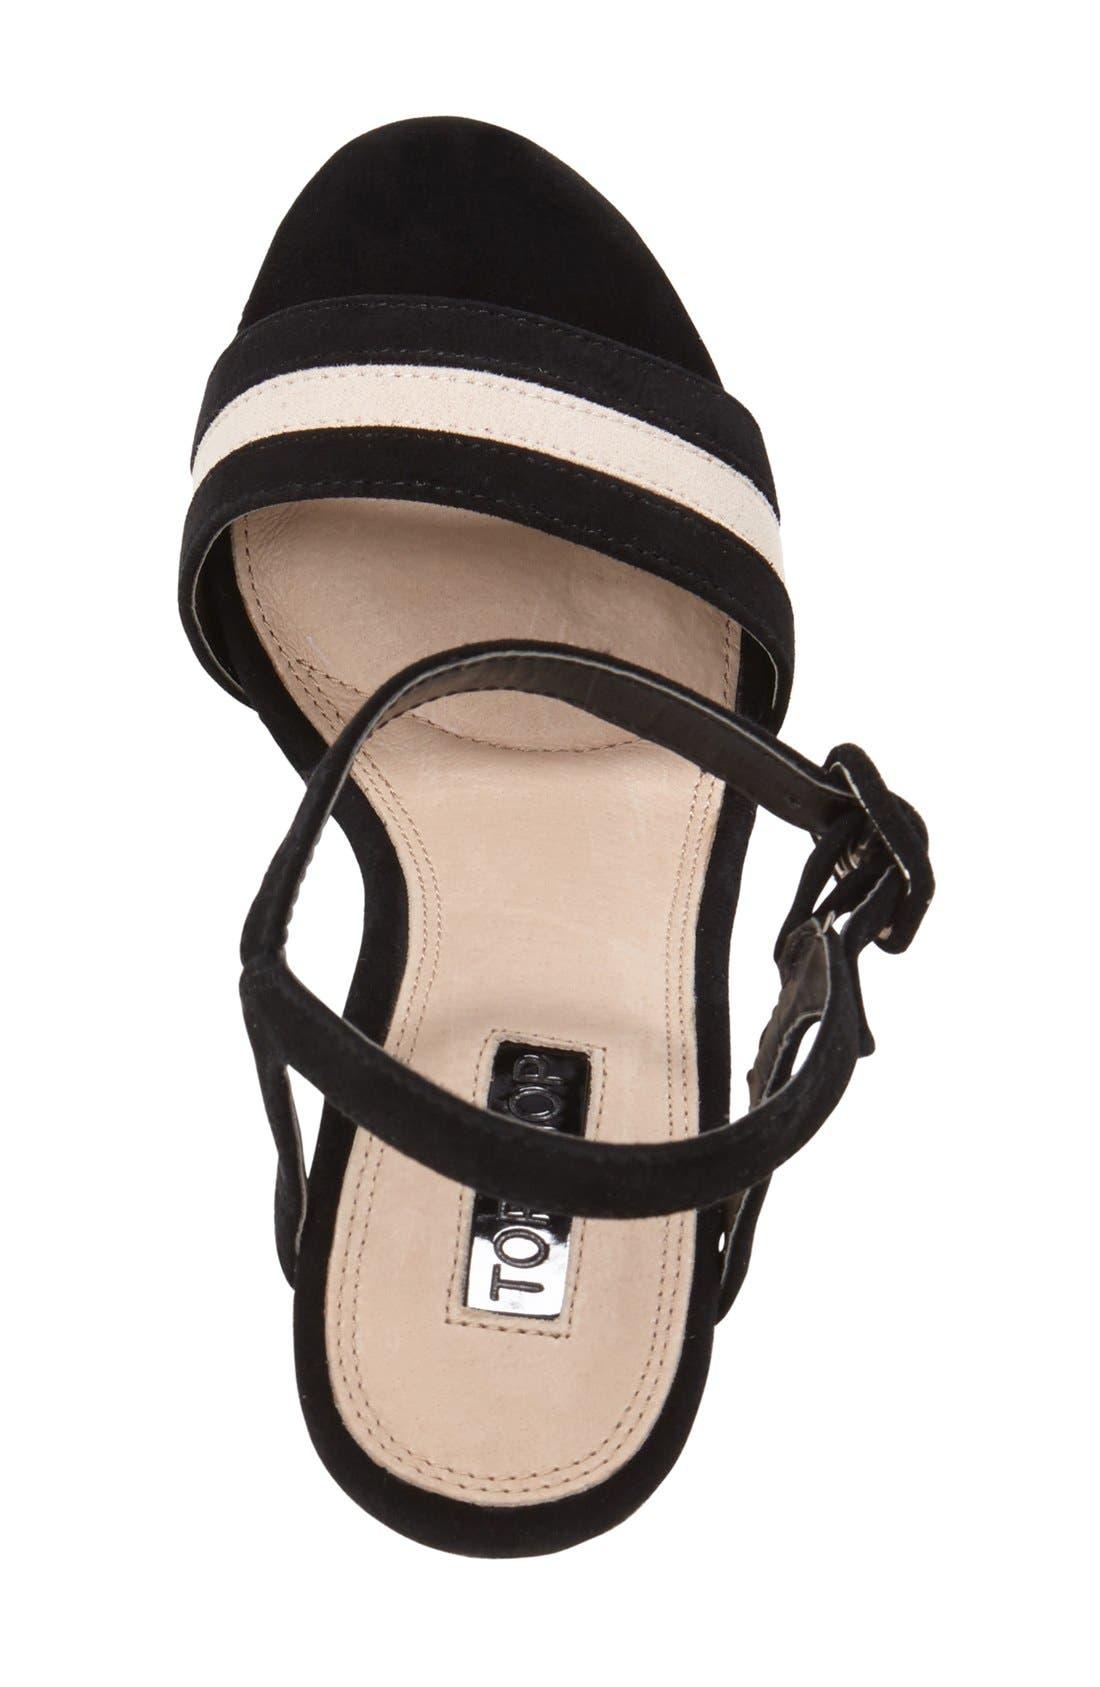 Alternate Image 3  - Topshop 'Laker' Platform Sandal (Women)